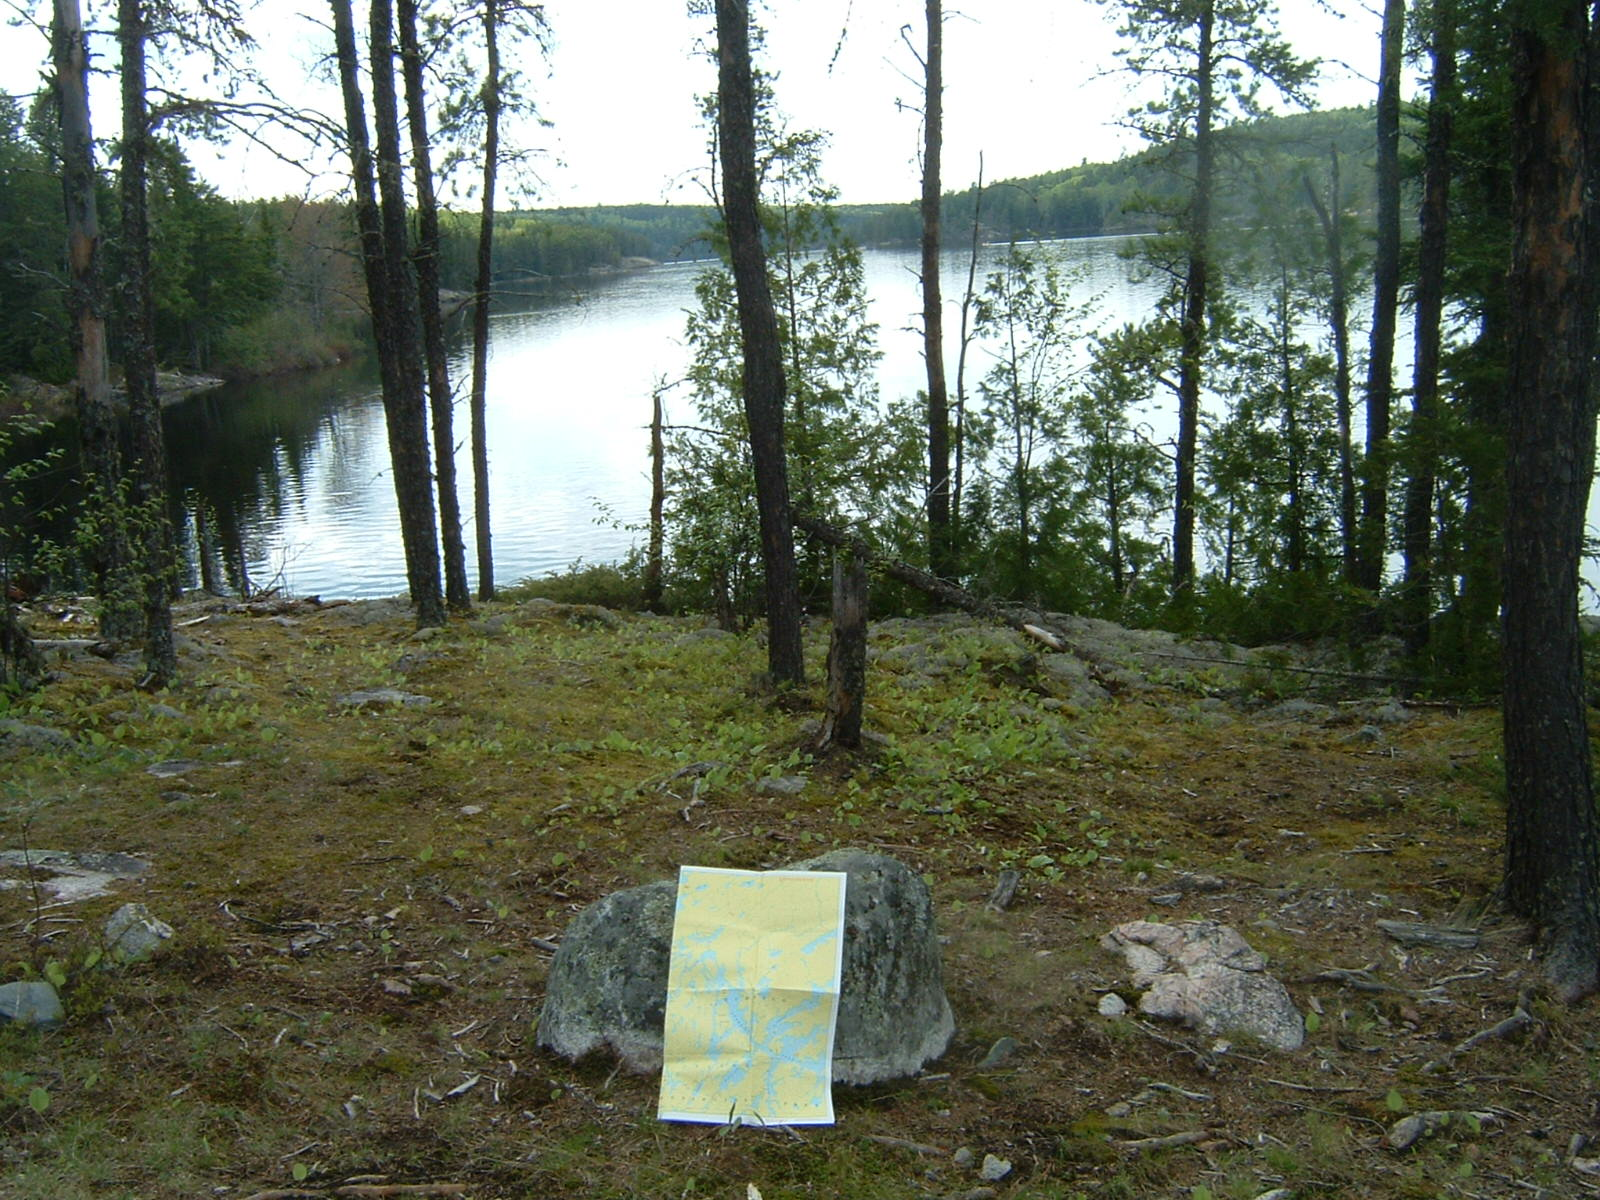 MAP SHOWING KAWNIPI LAKE